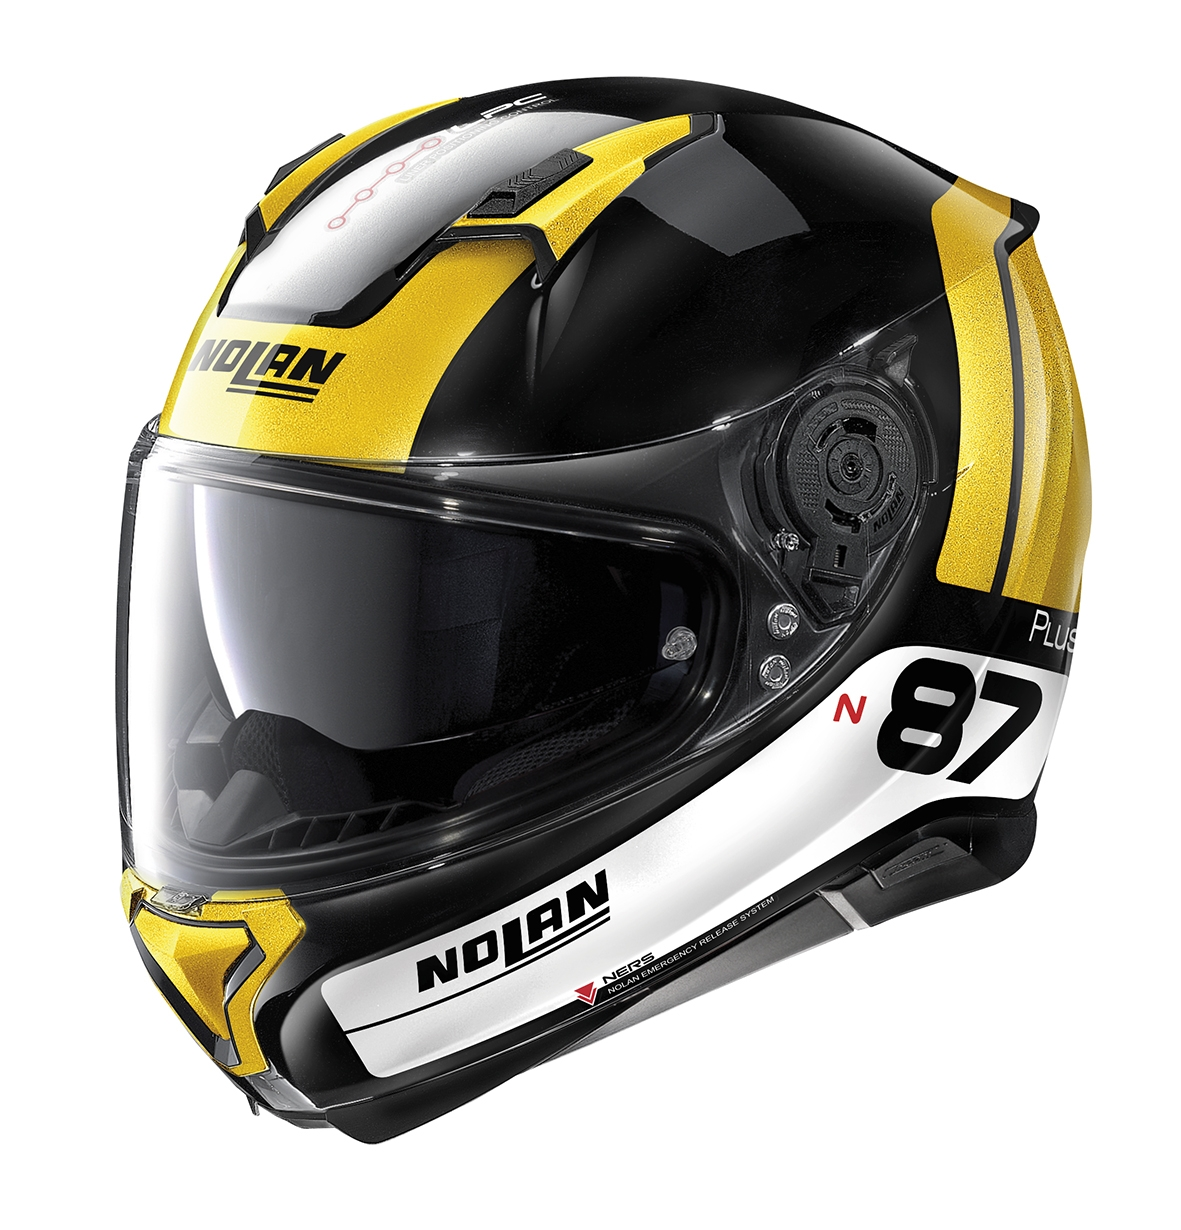 Moto helma Nolan N87 Plus Distinctive N-Com 27 žlutá